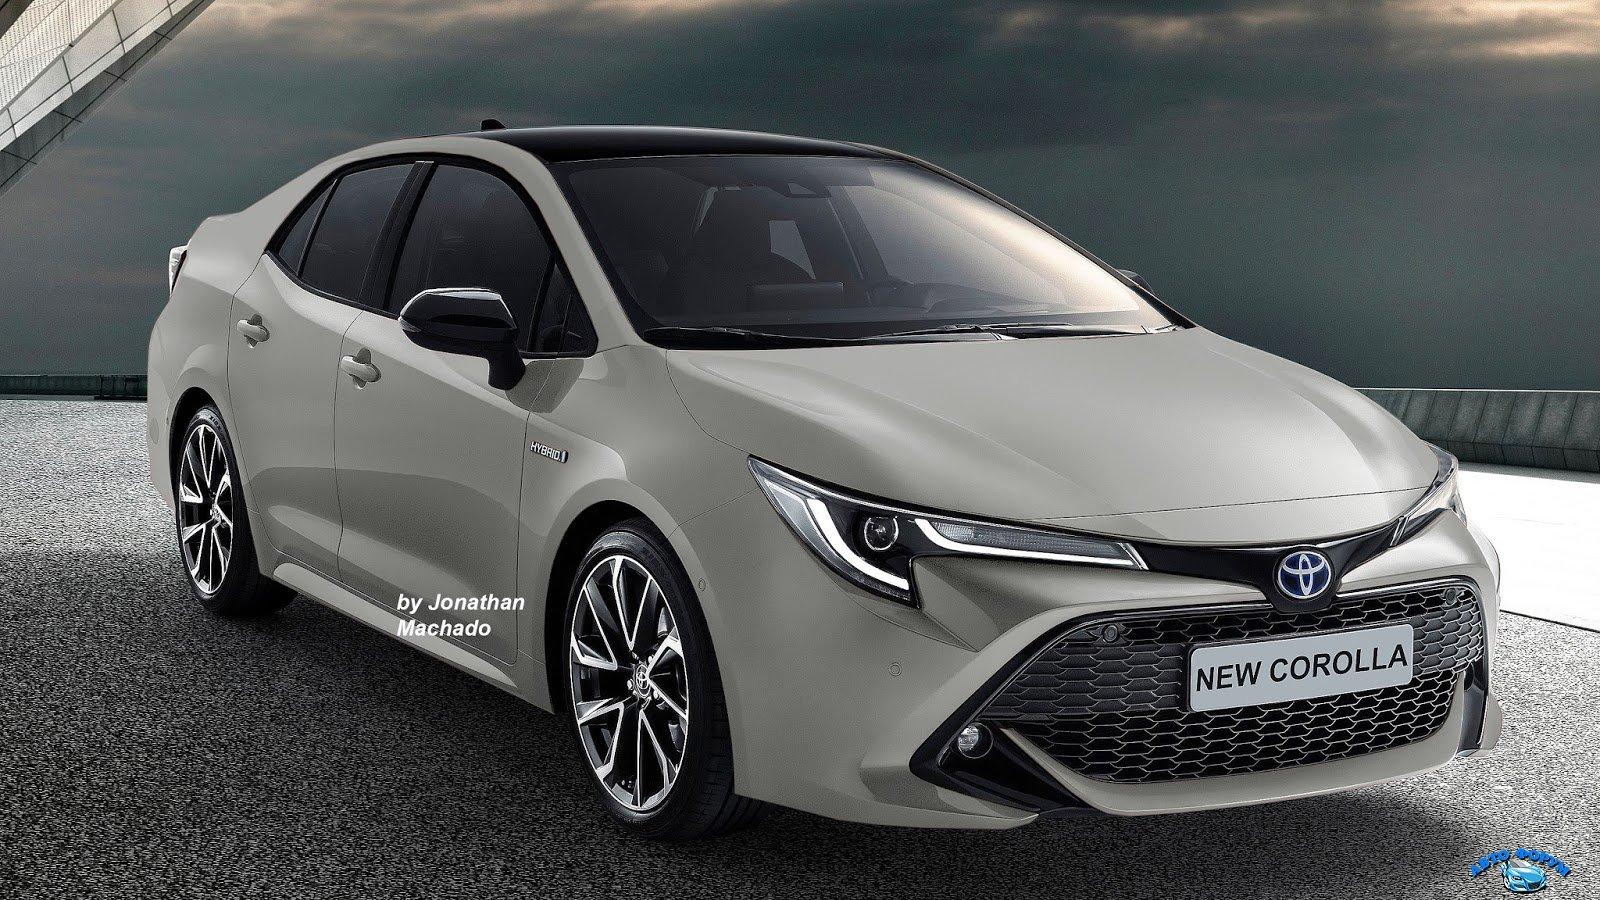 2019-Toyota-Corolla-Altis-2019-Toyota-Corolla-Sedan-rendering.jpg